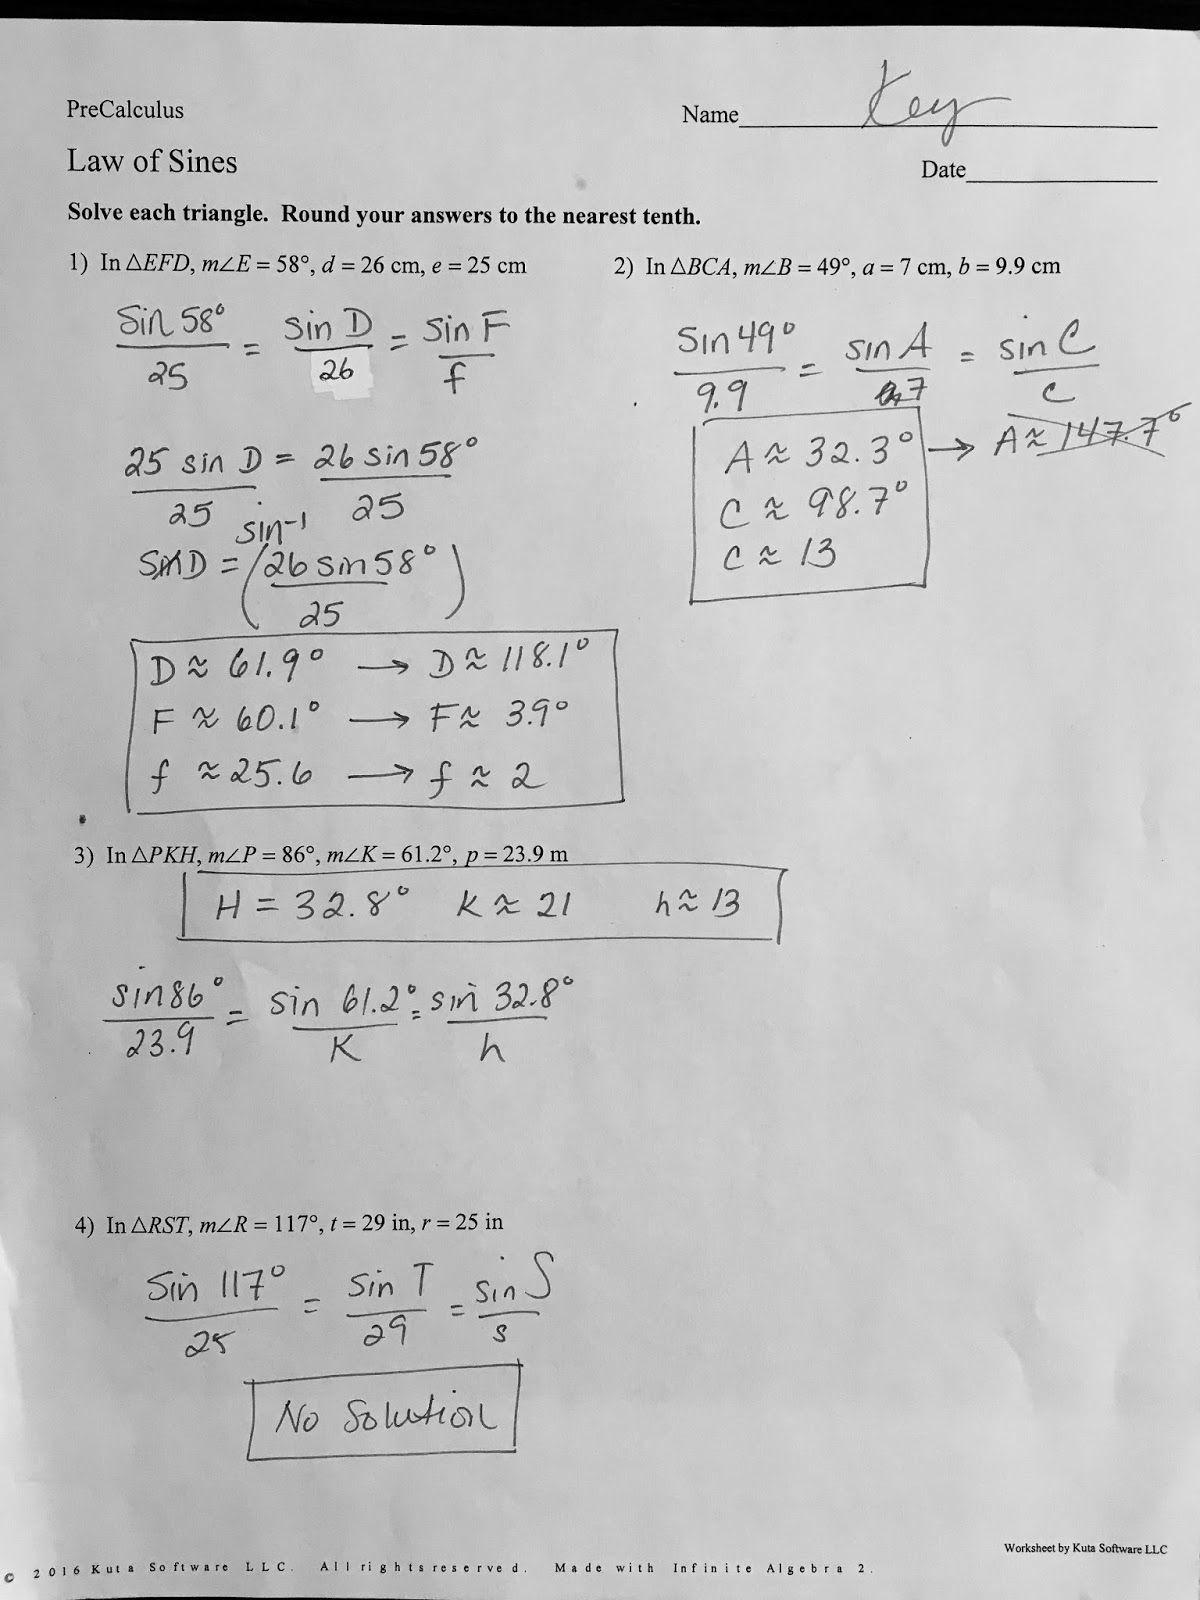 30 Solving Trigonometric Equations Worksheet Answers